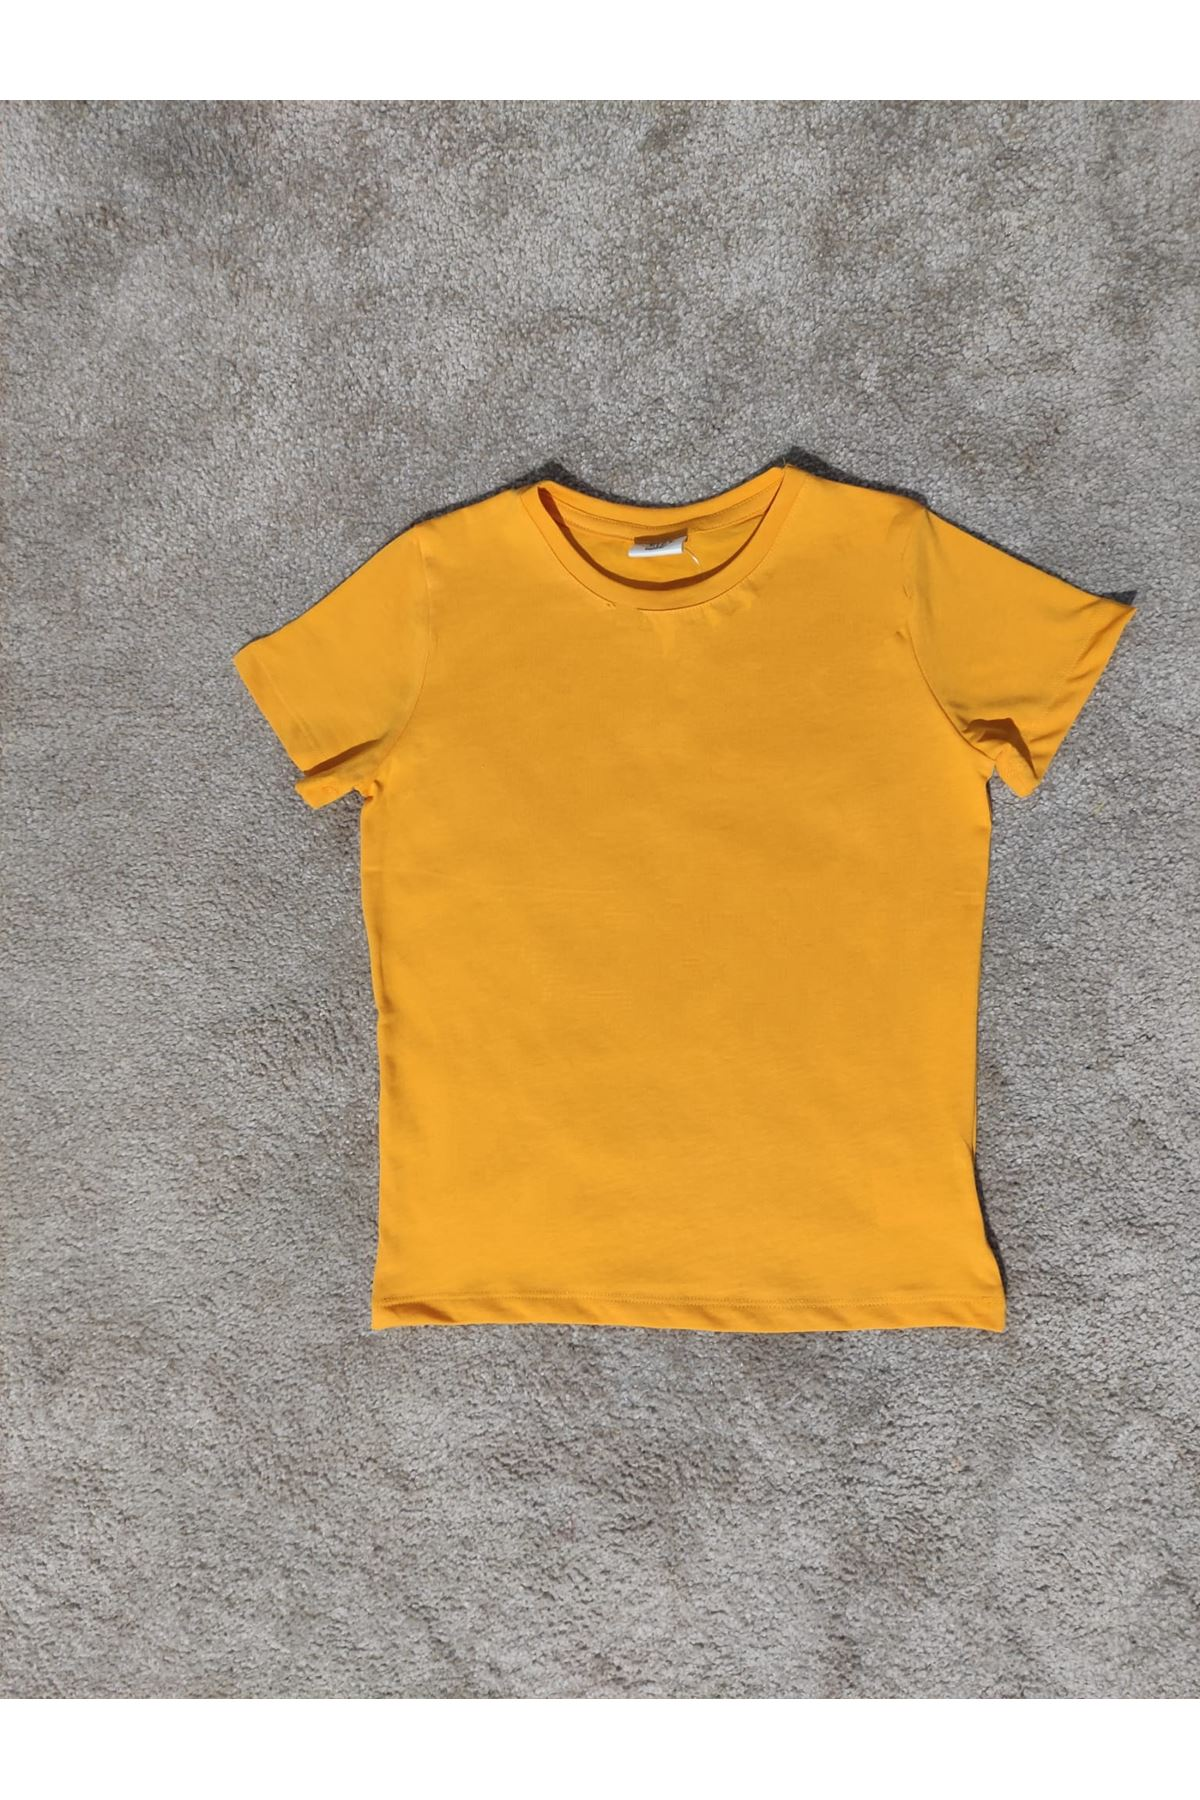 Kız Çocuk Bisiklet Yaka Hardal T-shirt